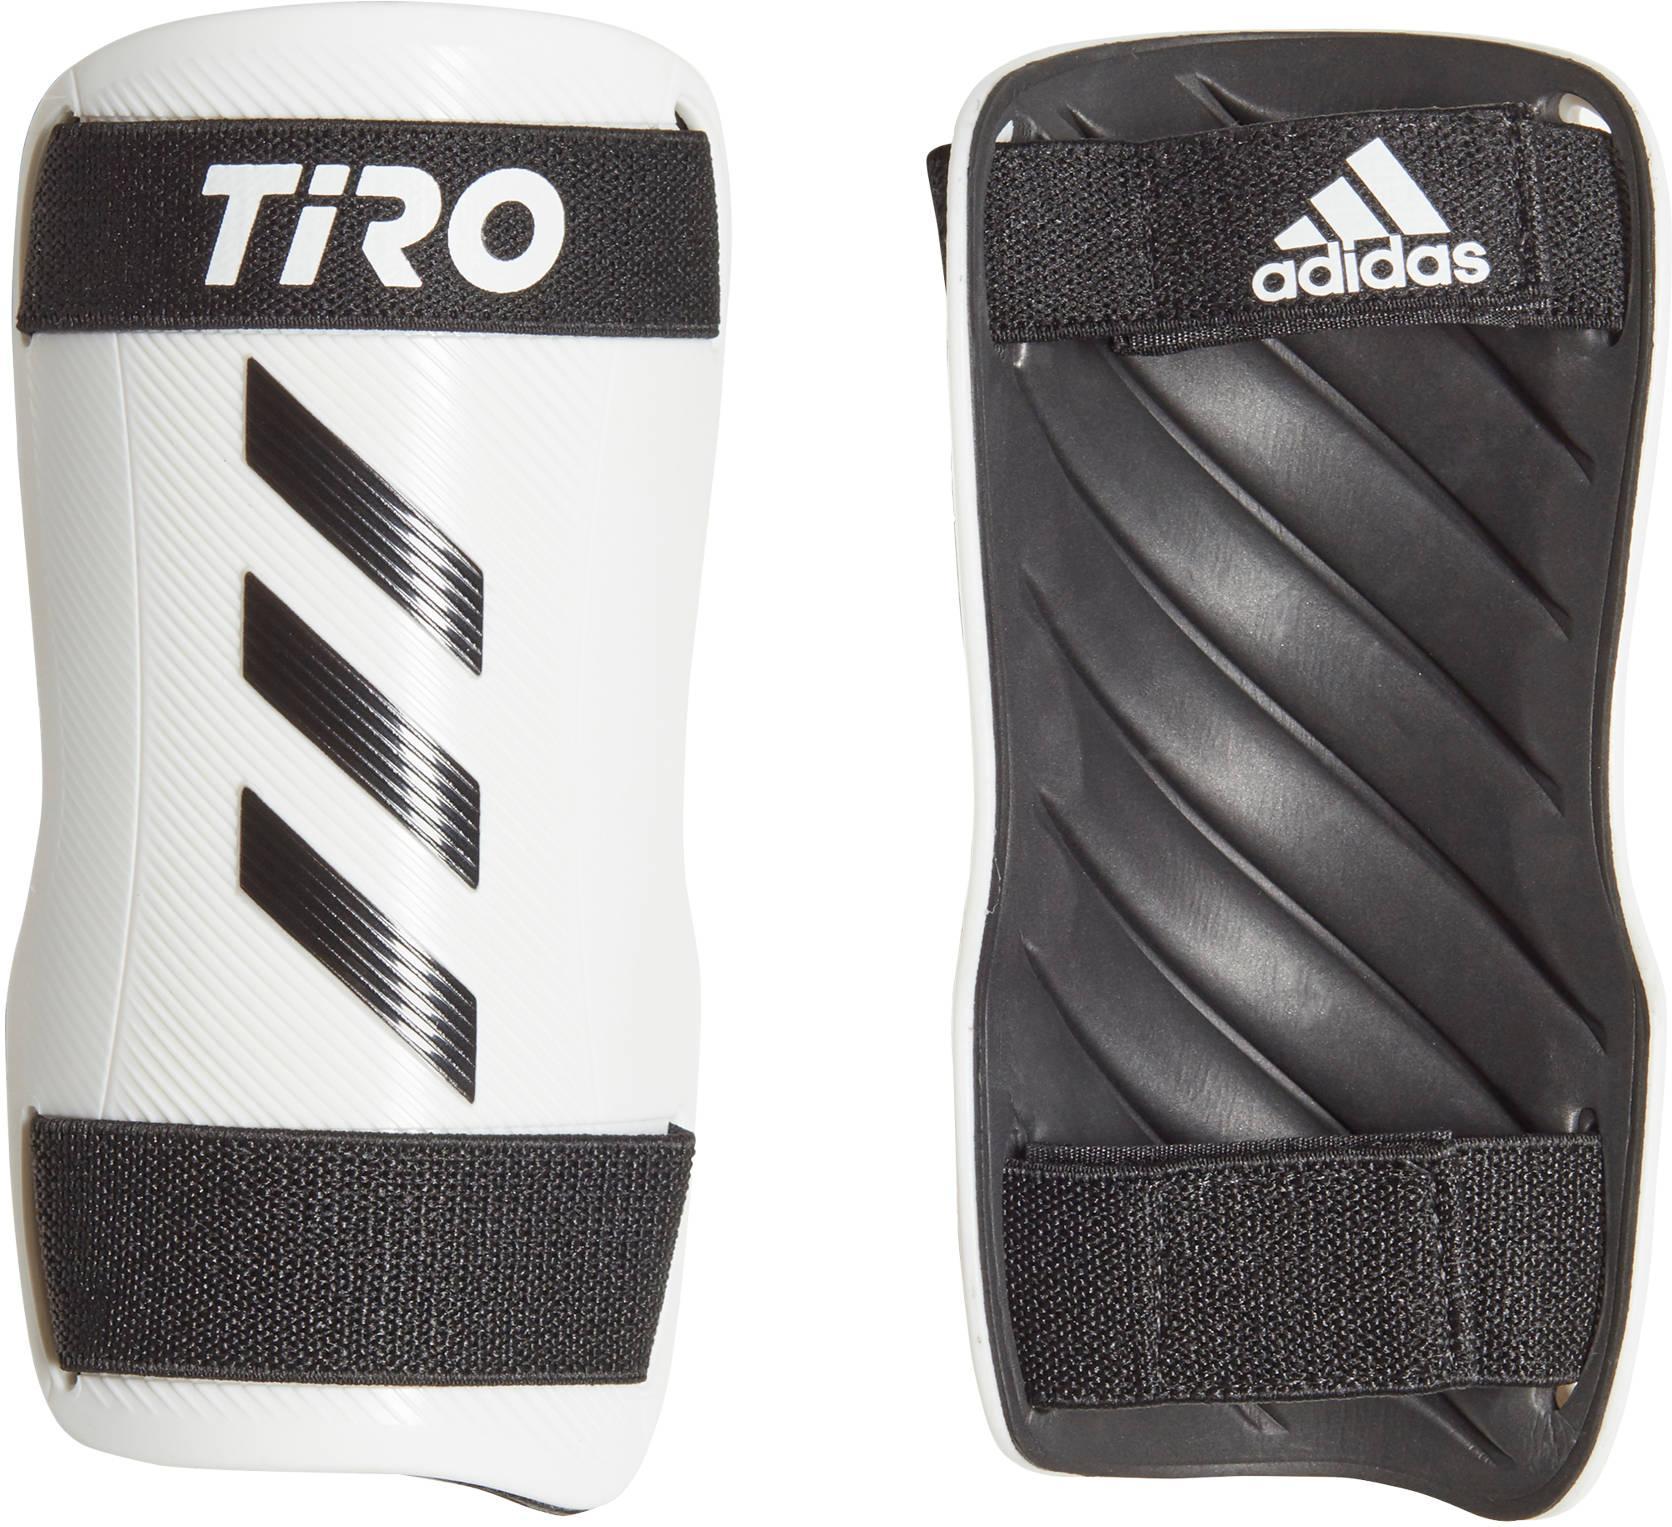 Chrániče adidas TIRO SG TRN